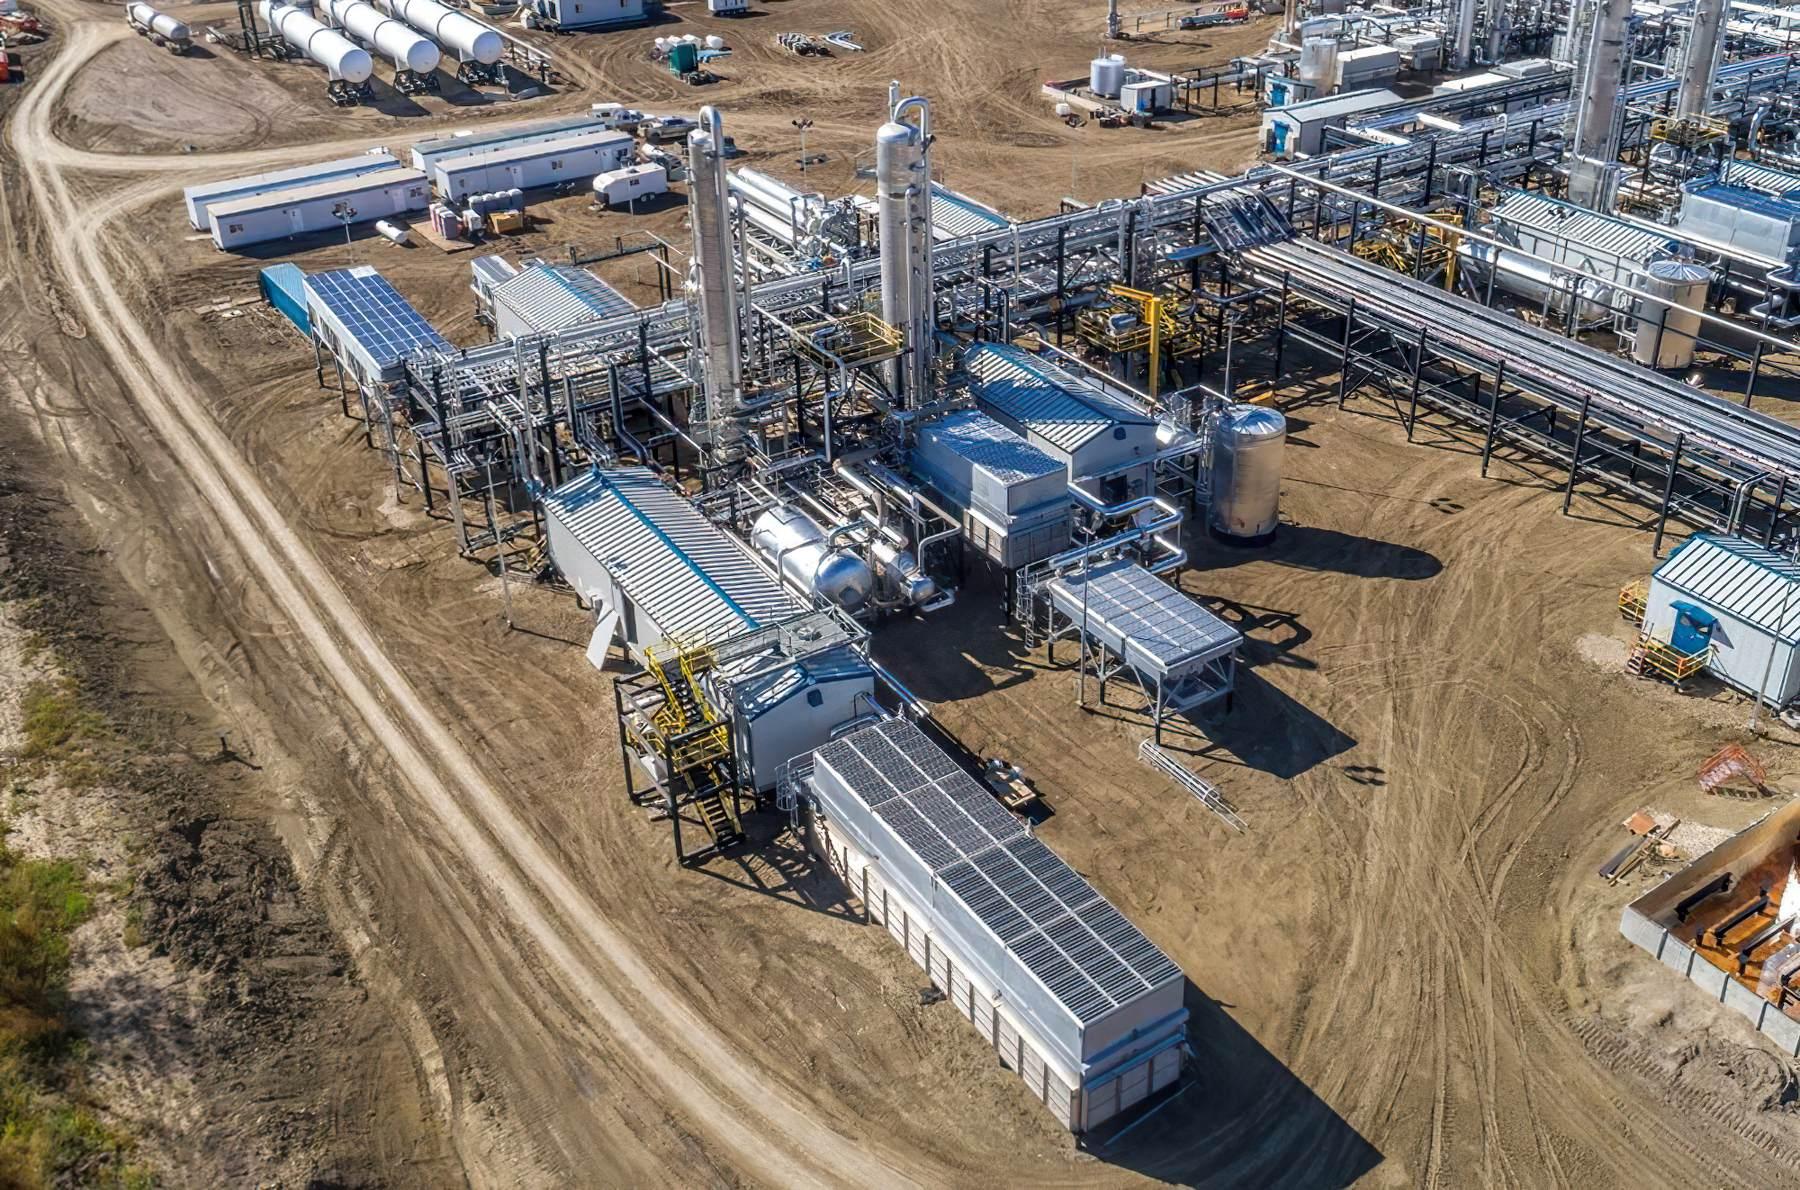 Carbon Capture Utilization & Storage